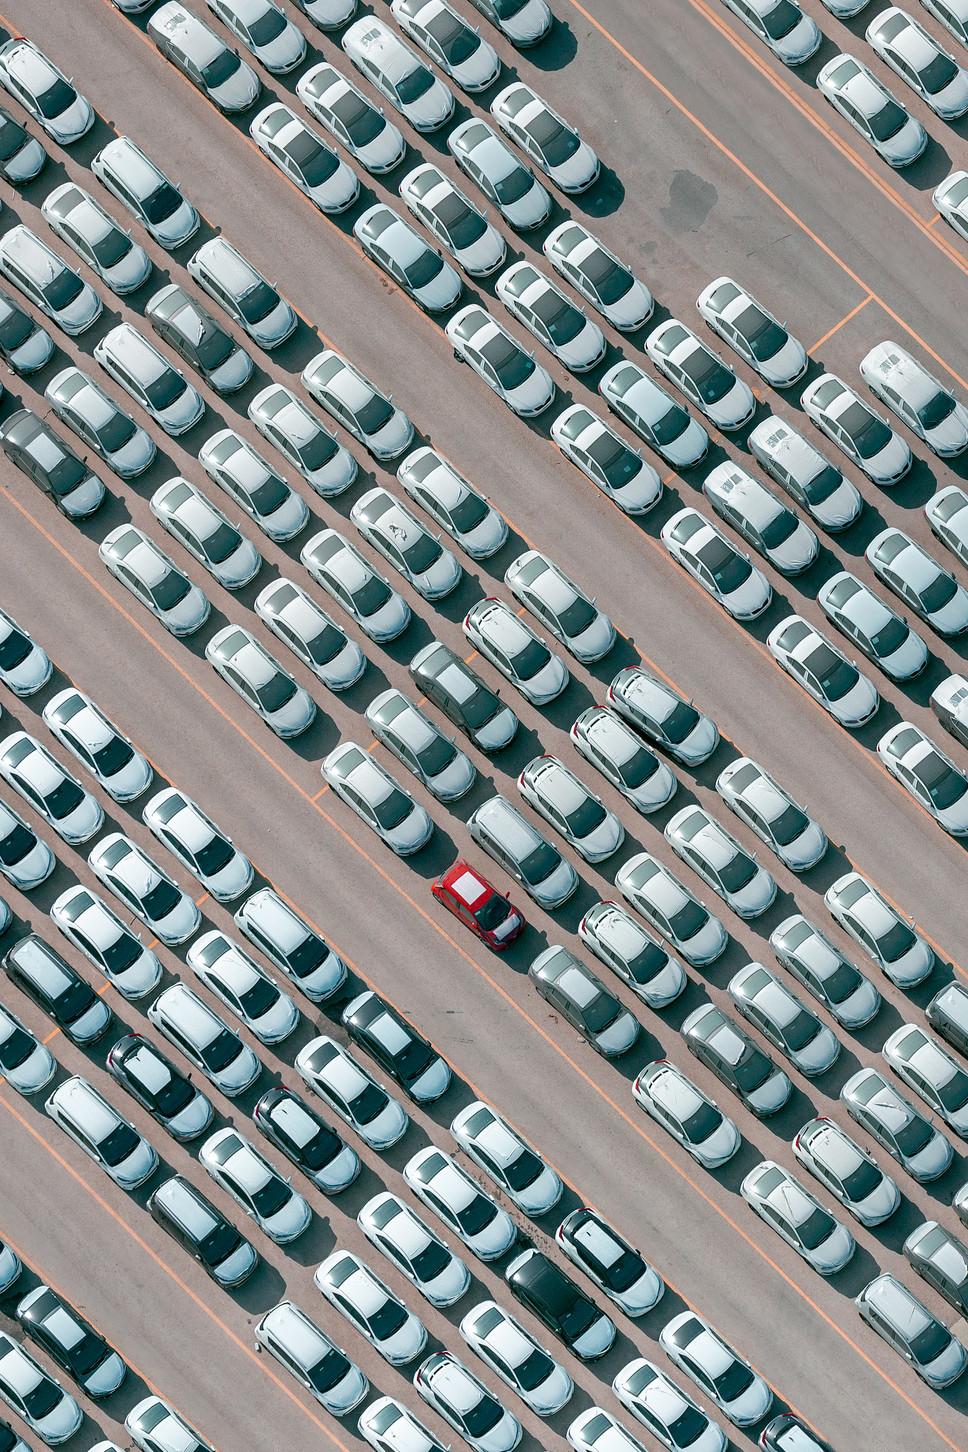 Corporate_Port of Ashdod_Cars 002.jpg